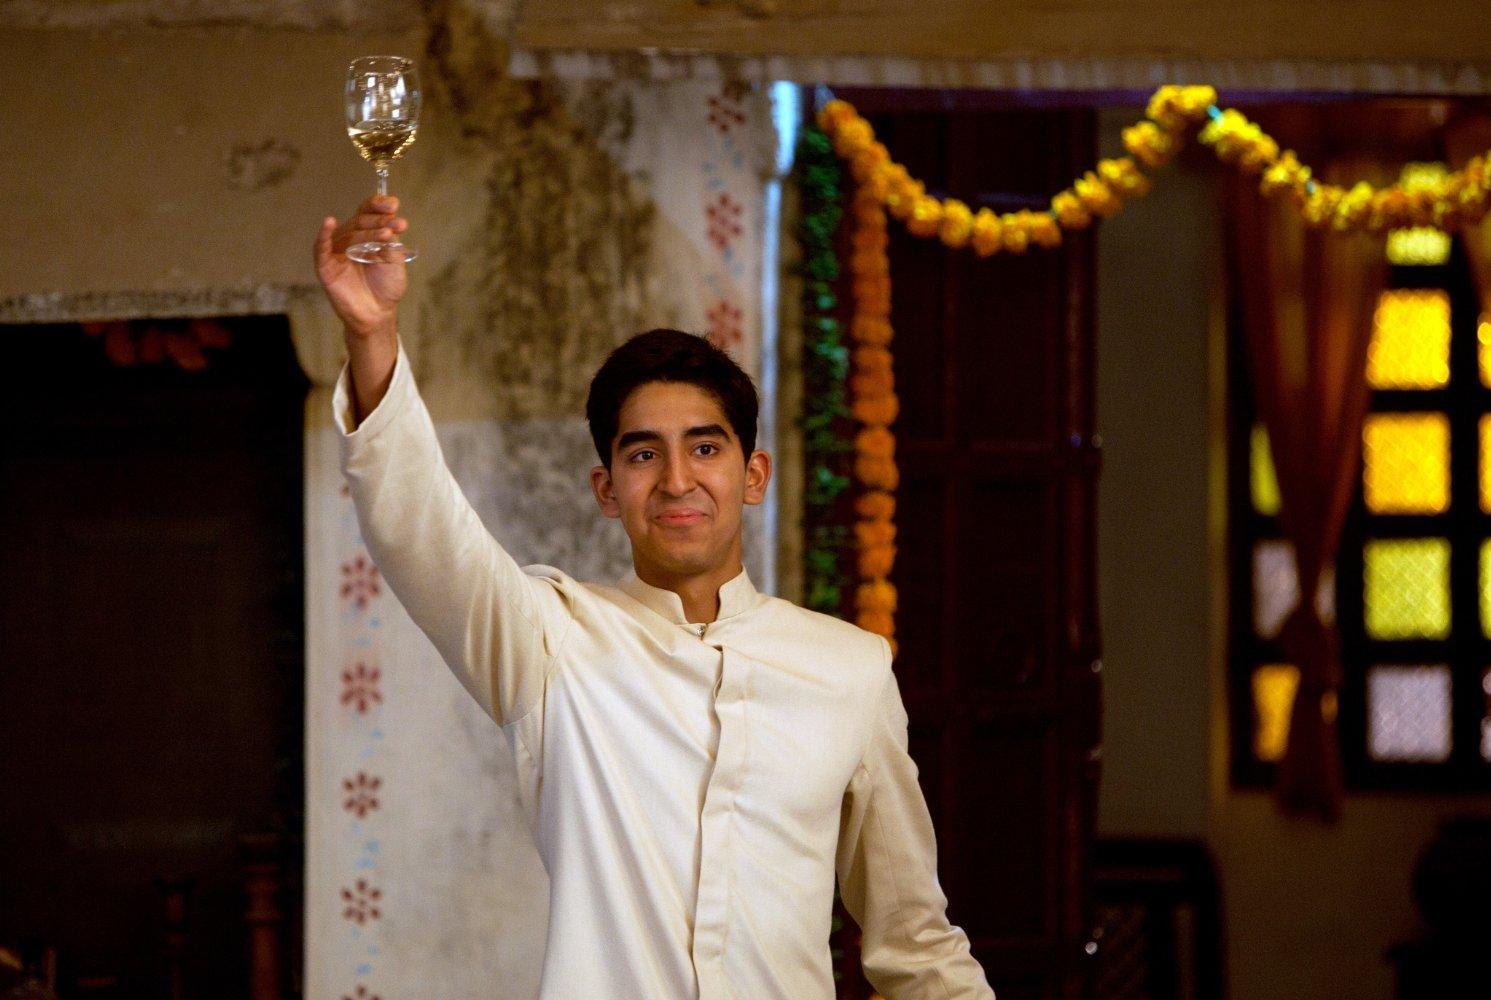 Dev Patel in The Best Exotic Marigold Hotel. (Twentieth Century Fox/IMDB)